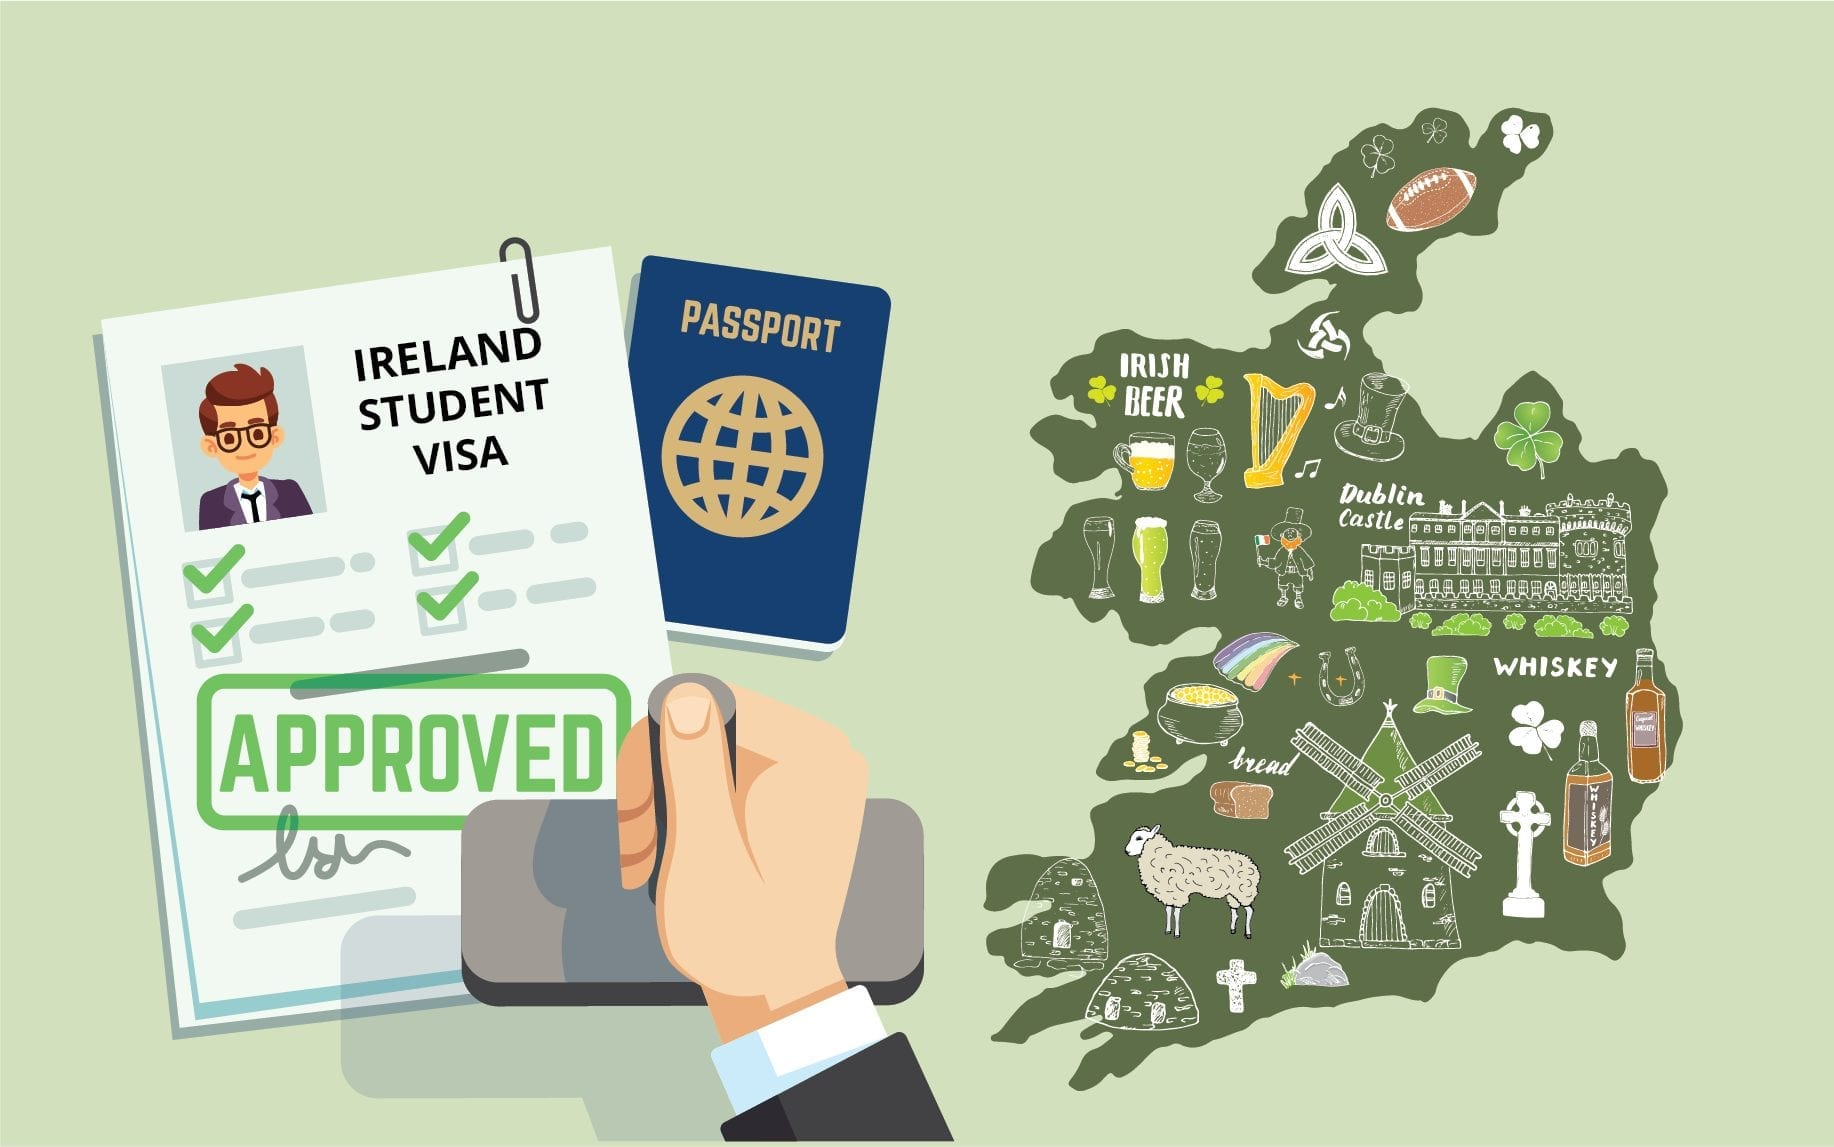 Ireland Student Visa